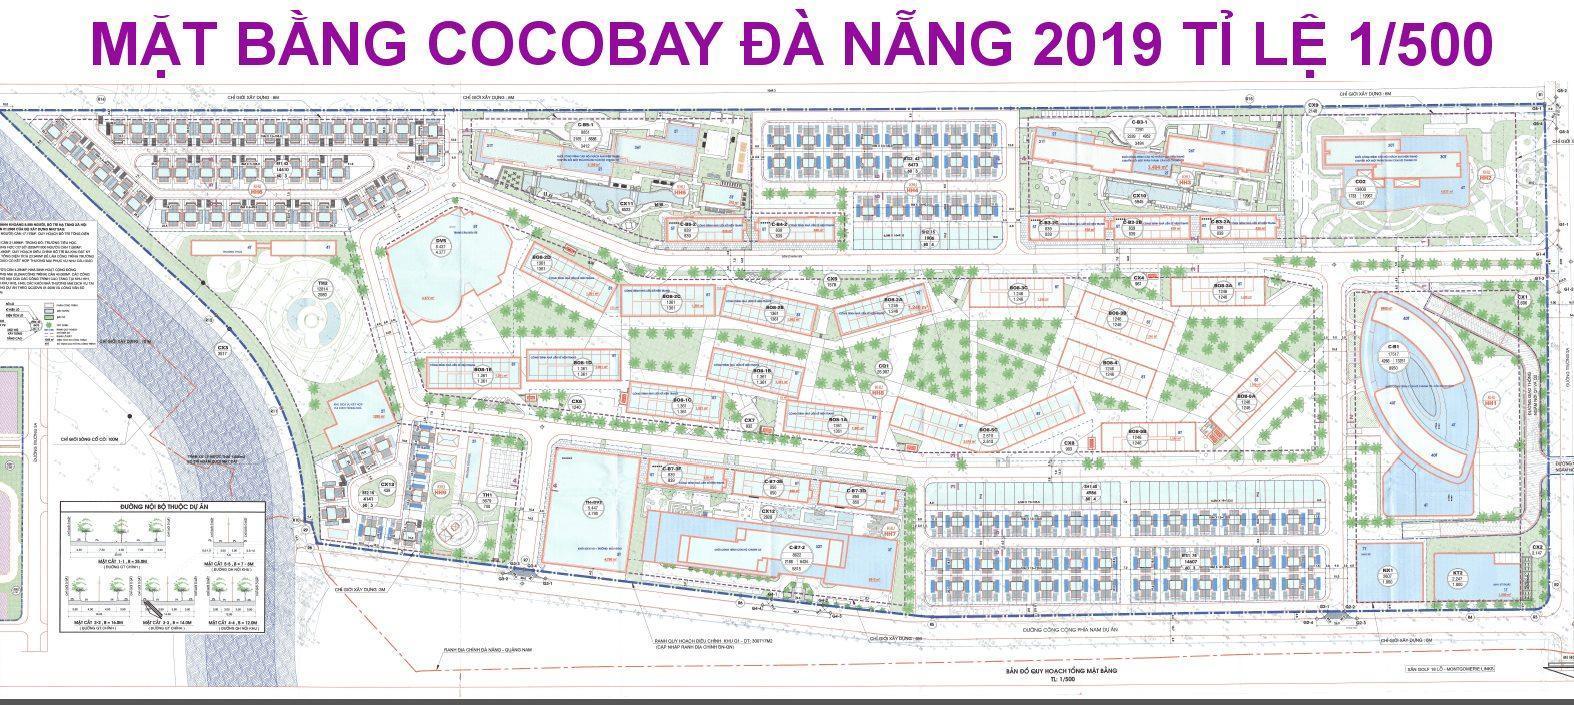 Sơ Đồ Mặt Bằng Cocobay Da Nang 2019